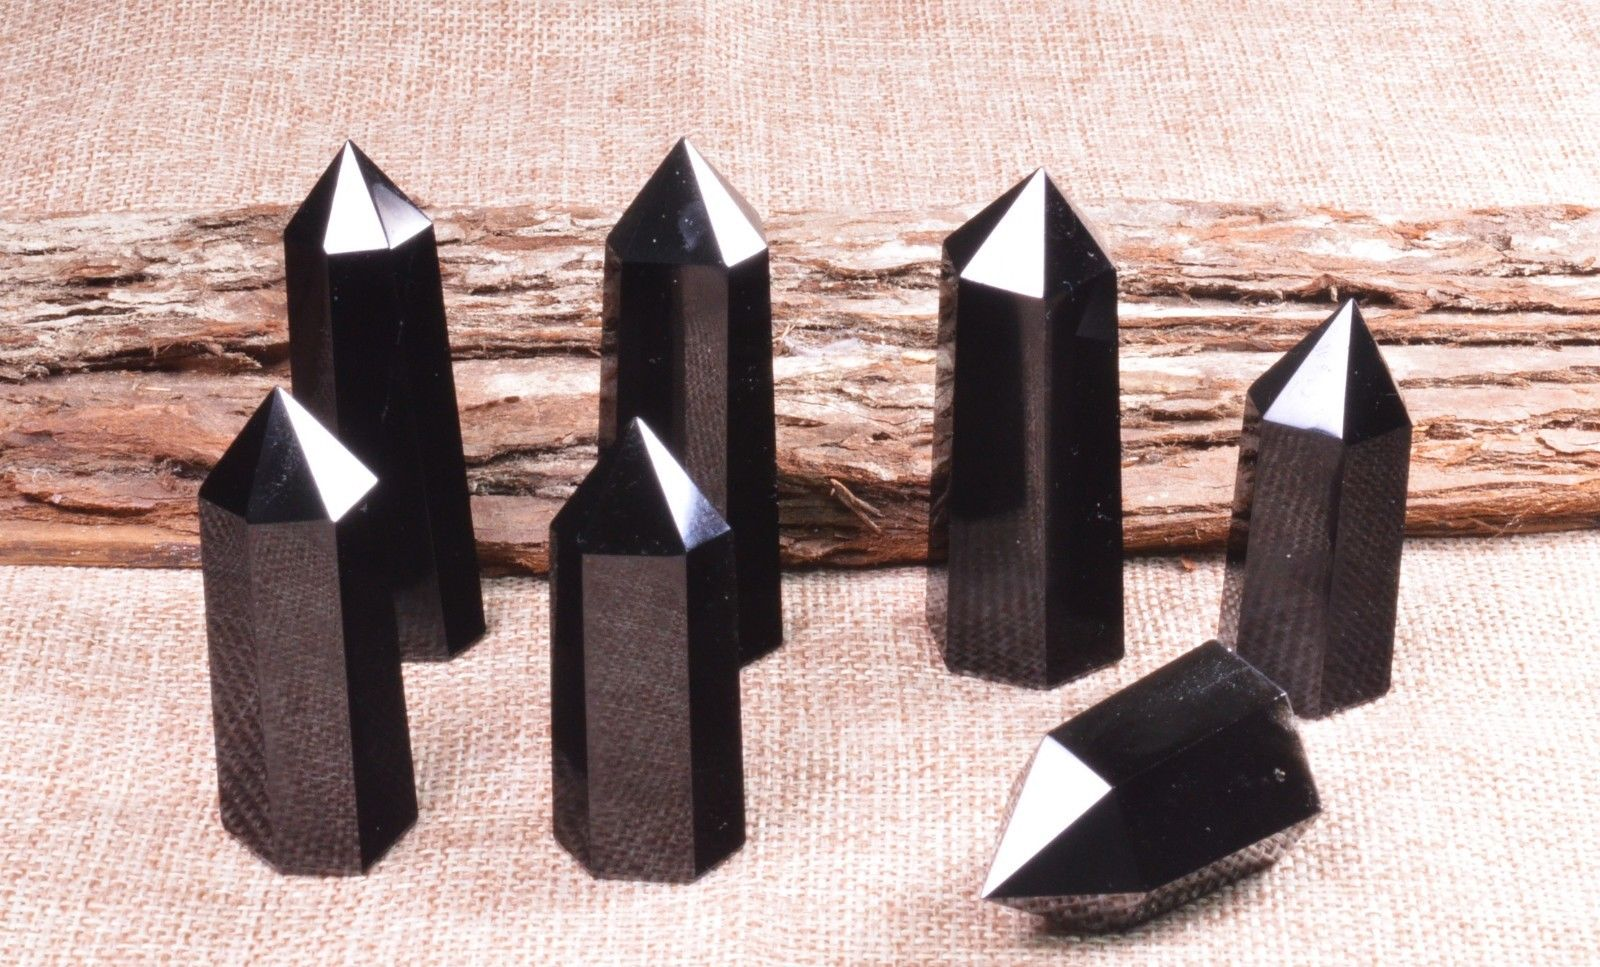 Natural negro obsidiana cuarzo varita Cruystal gema punto Mineral espécimen reiki curación 1 ud.